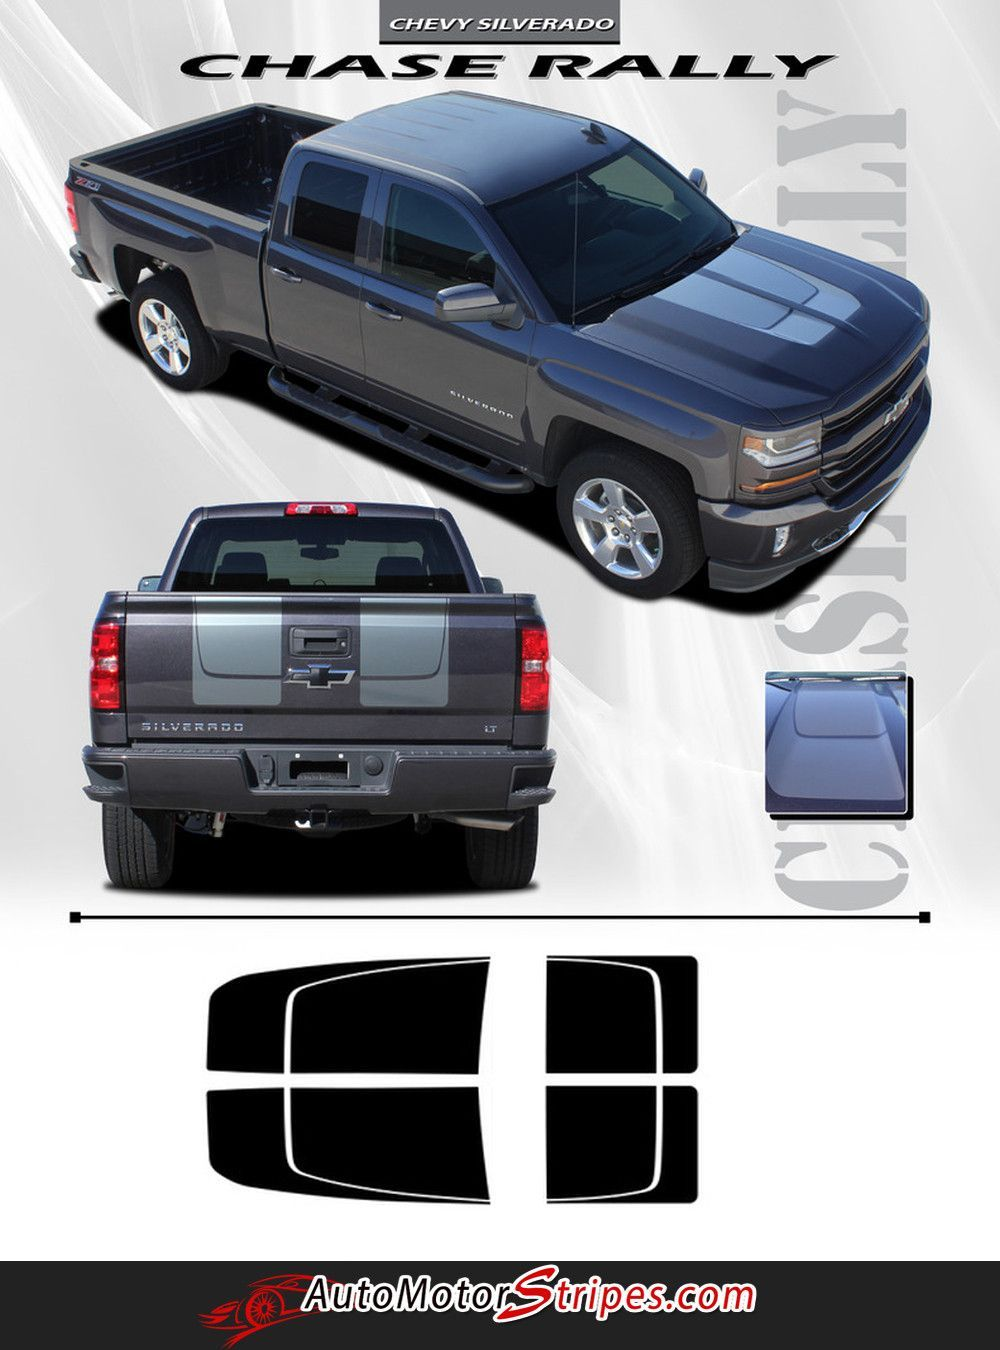 Chevy Silverado Racing Stripes Vinyl Graphic Decals M - Chevy decals for trucksmore decalchevrolet silverado rally edition unveiled